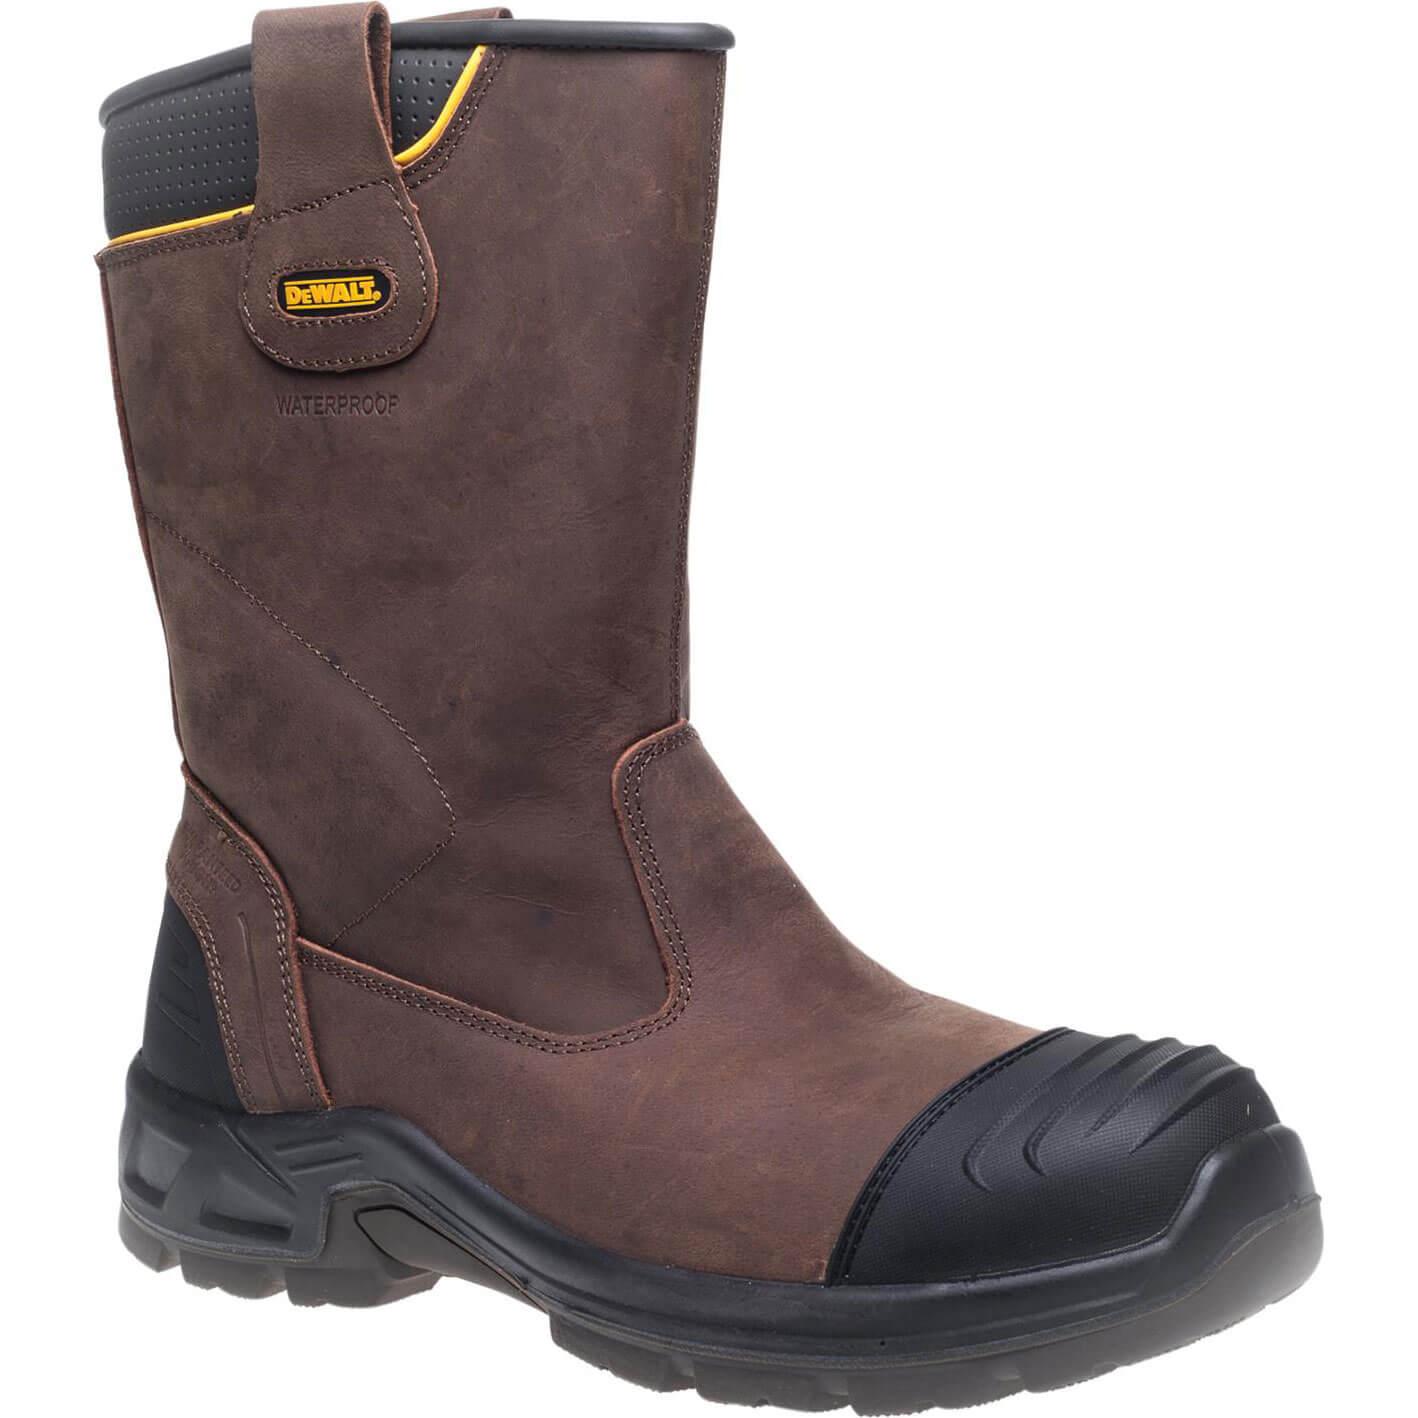 DeWalt Mens Millington Waterproof Rigger Boots Brown Size 10